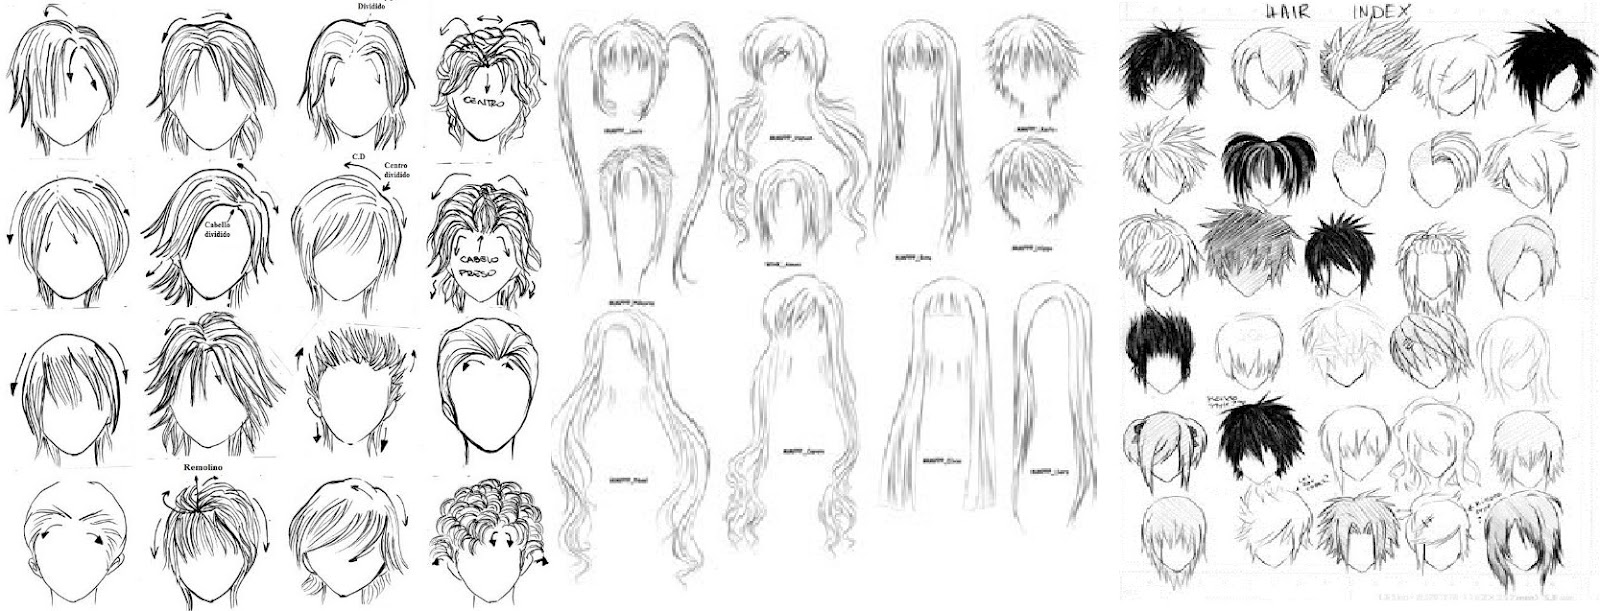 Banging peinados manga Galería de cortes de pelo Consejos - VL. Anime: Anime